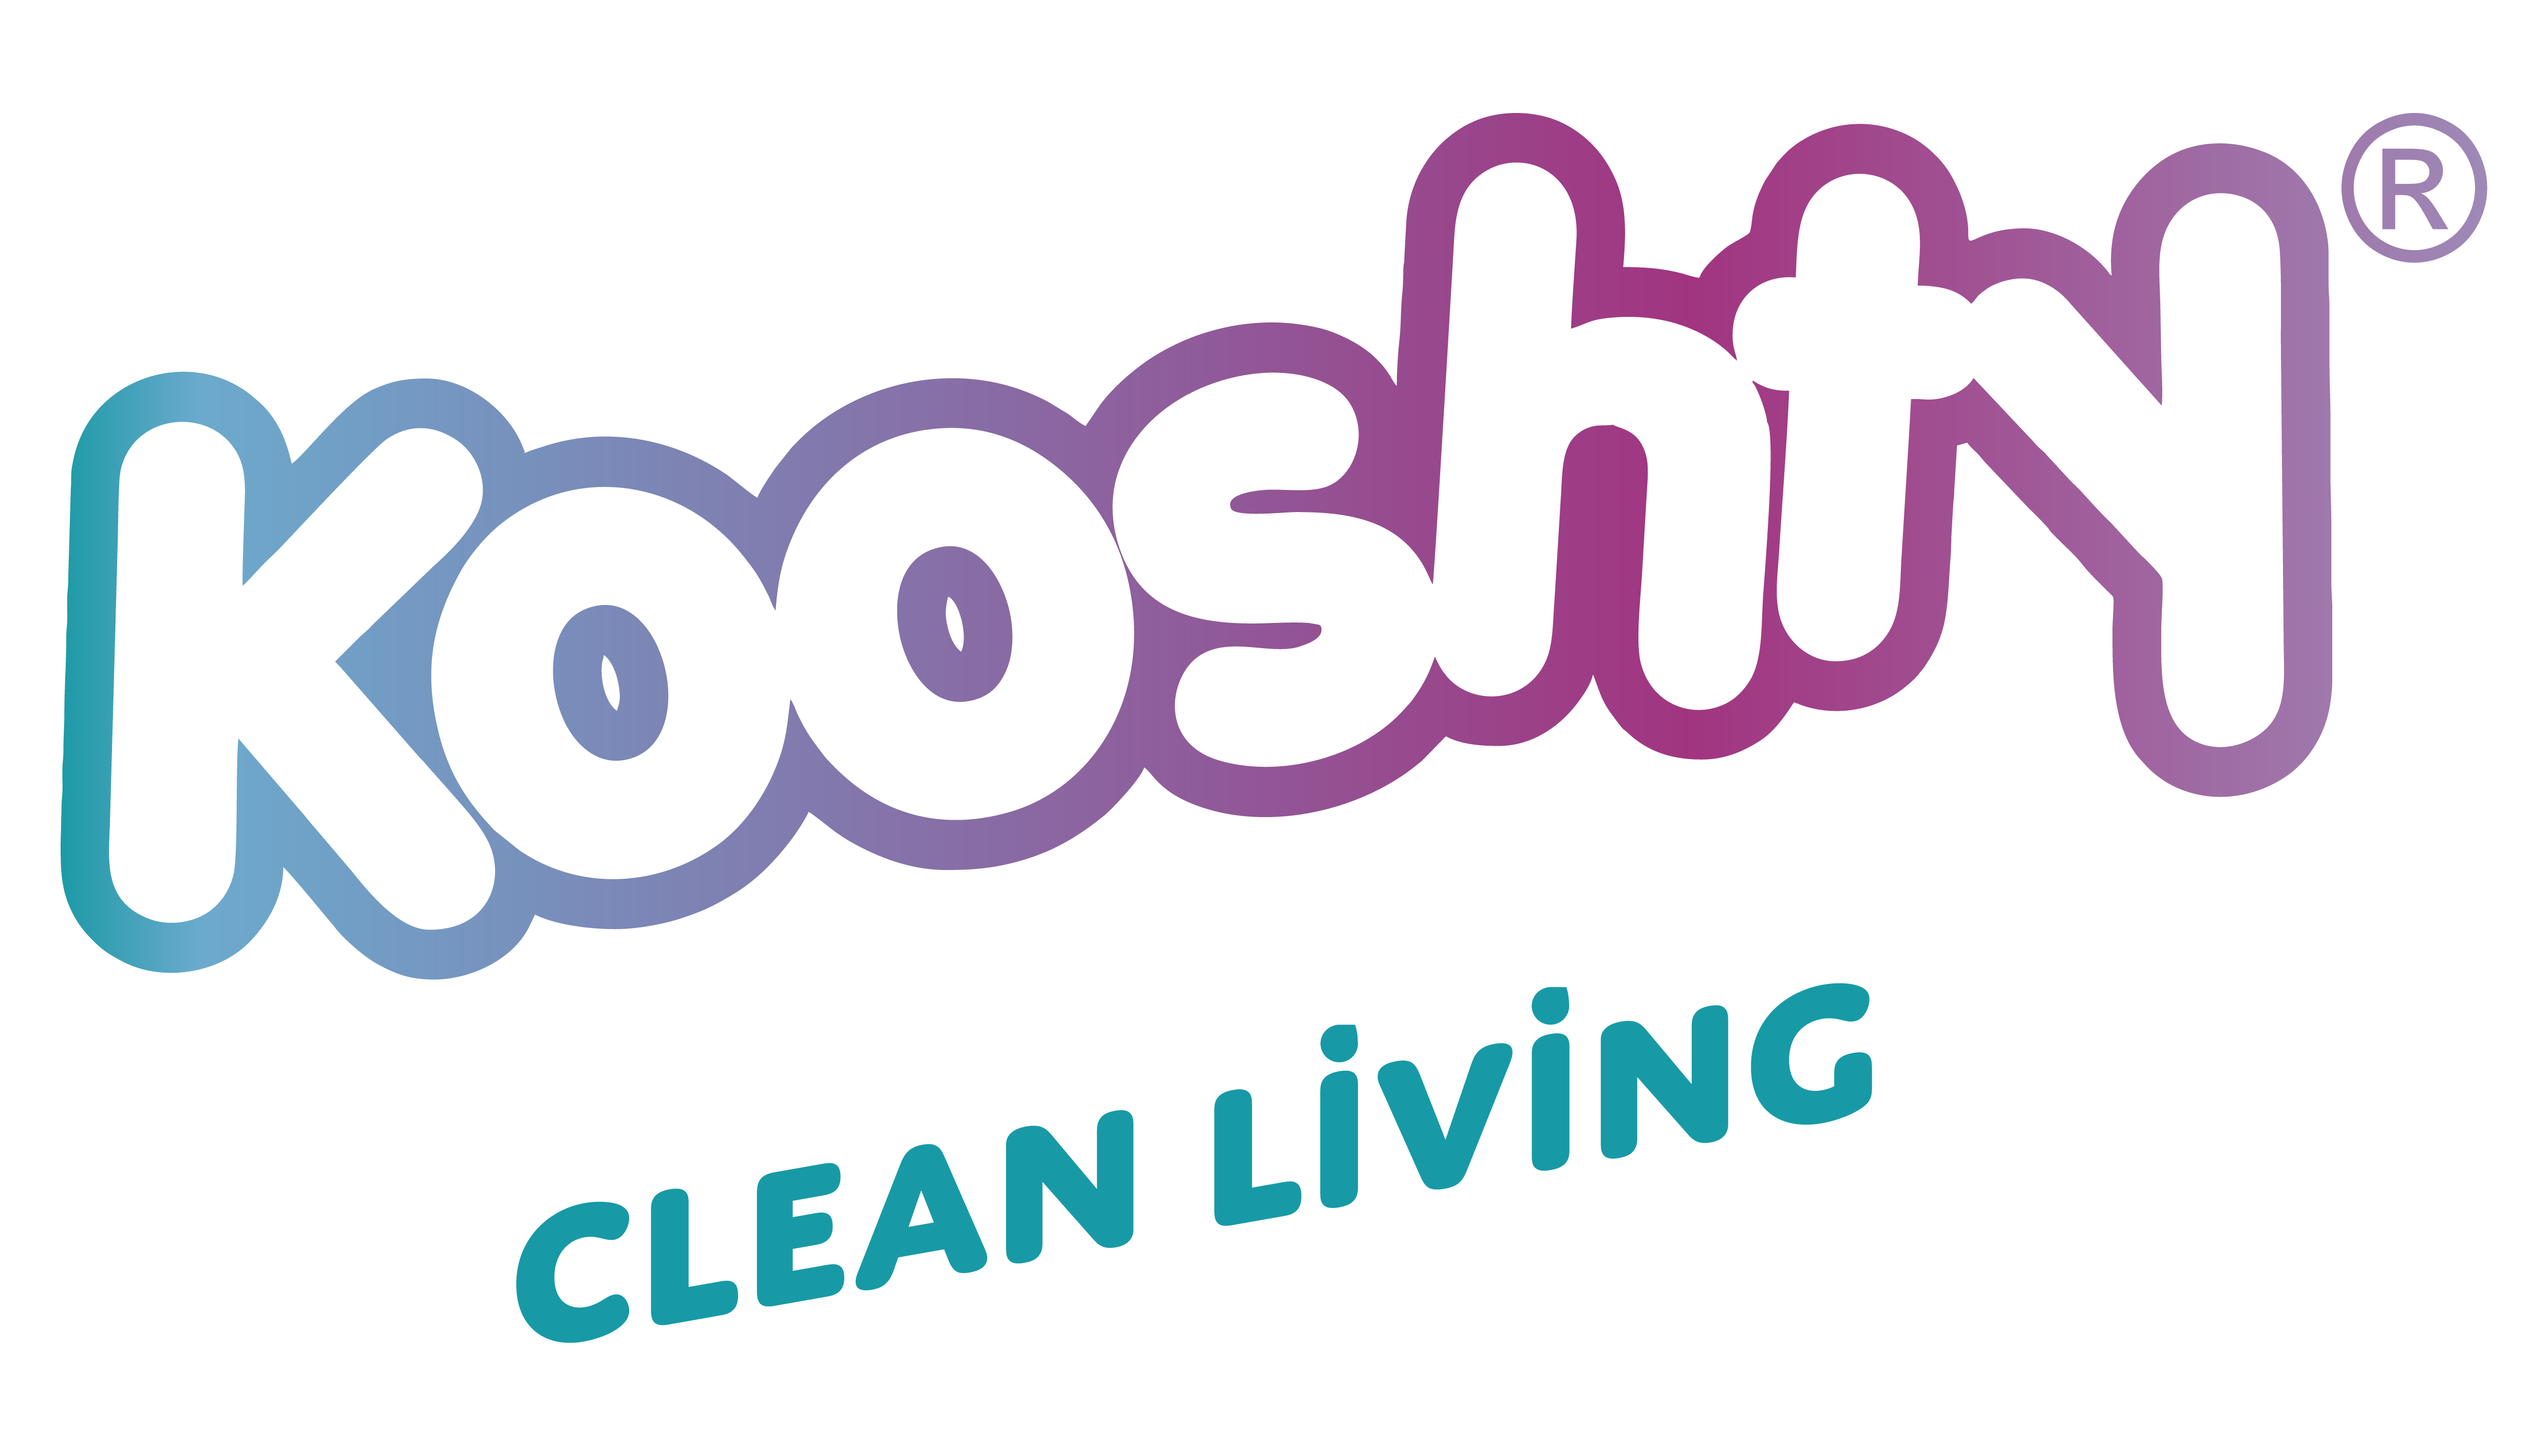 kooshty-logo-colour.png